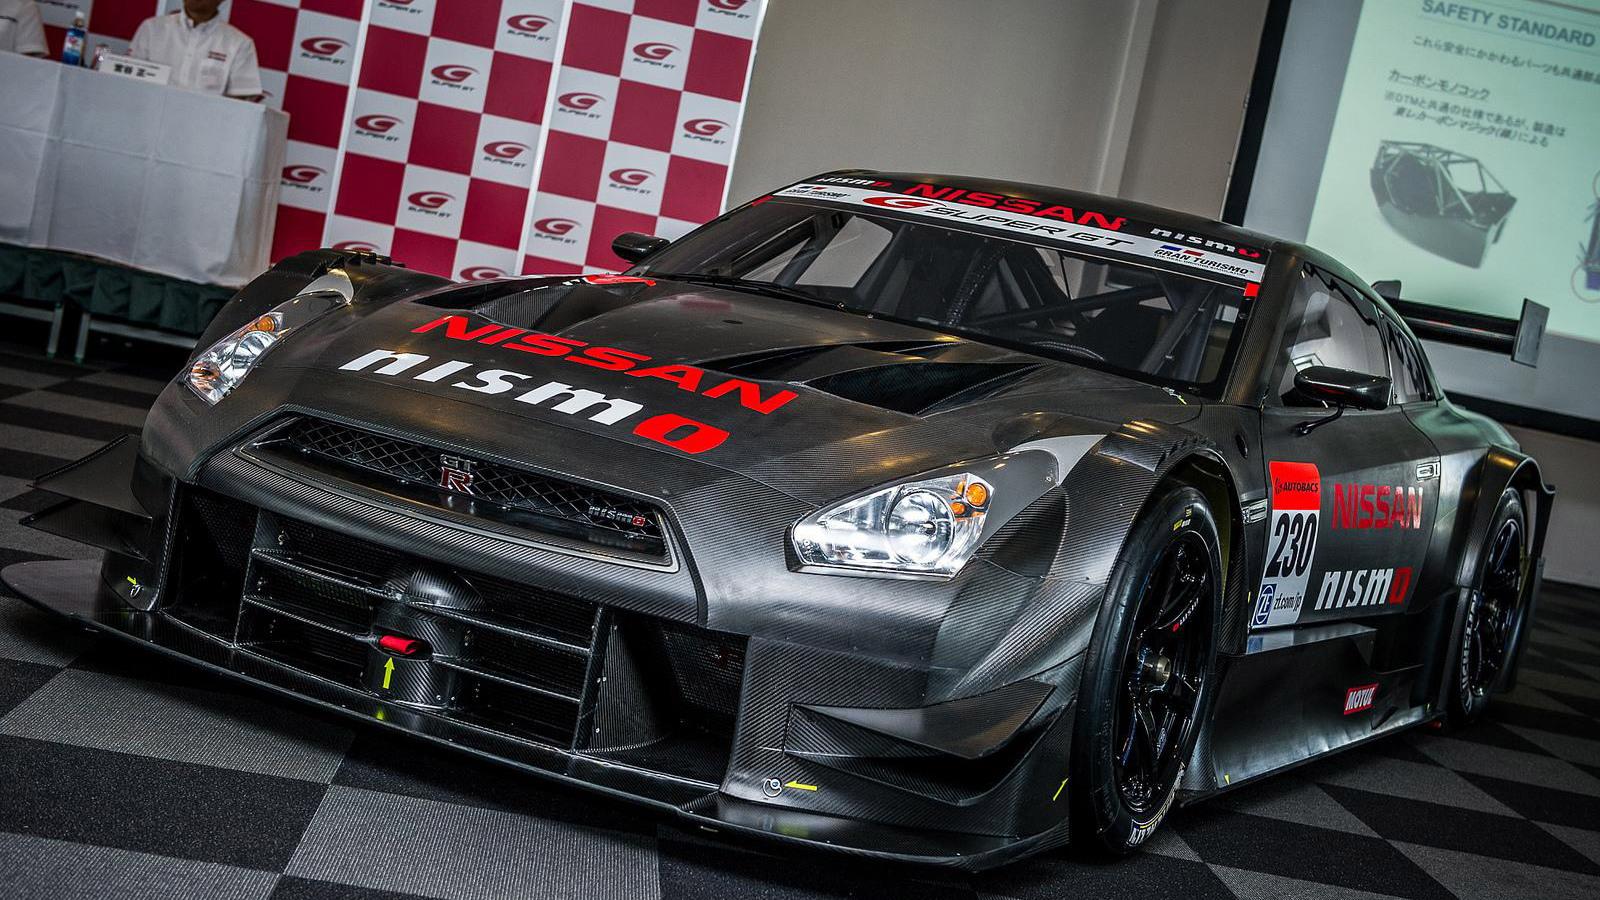 2014 Nissan GT-R NISMO GT500 Super GT race car